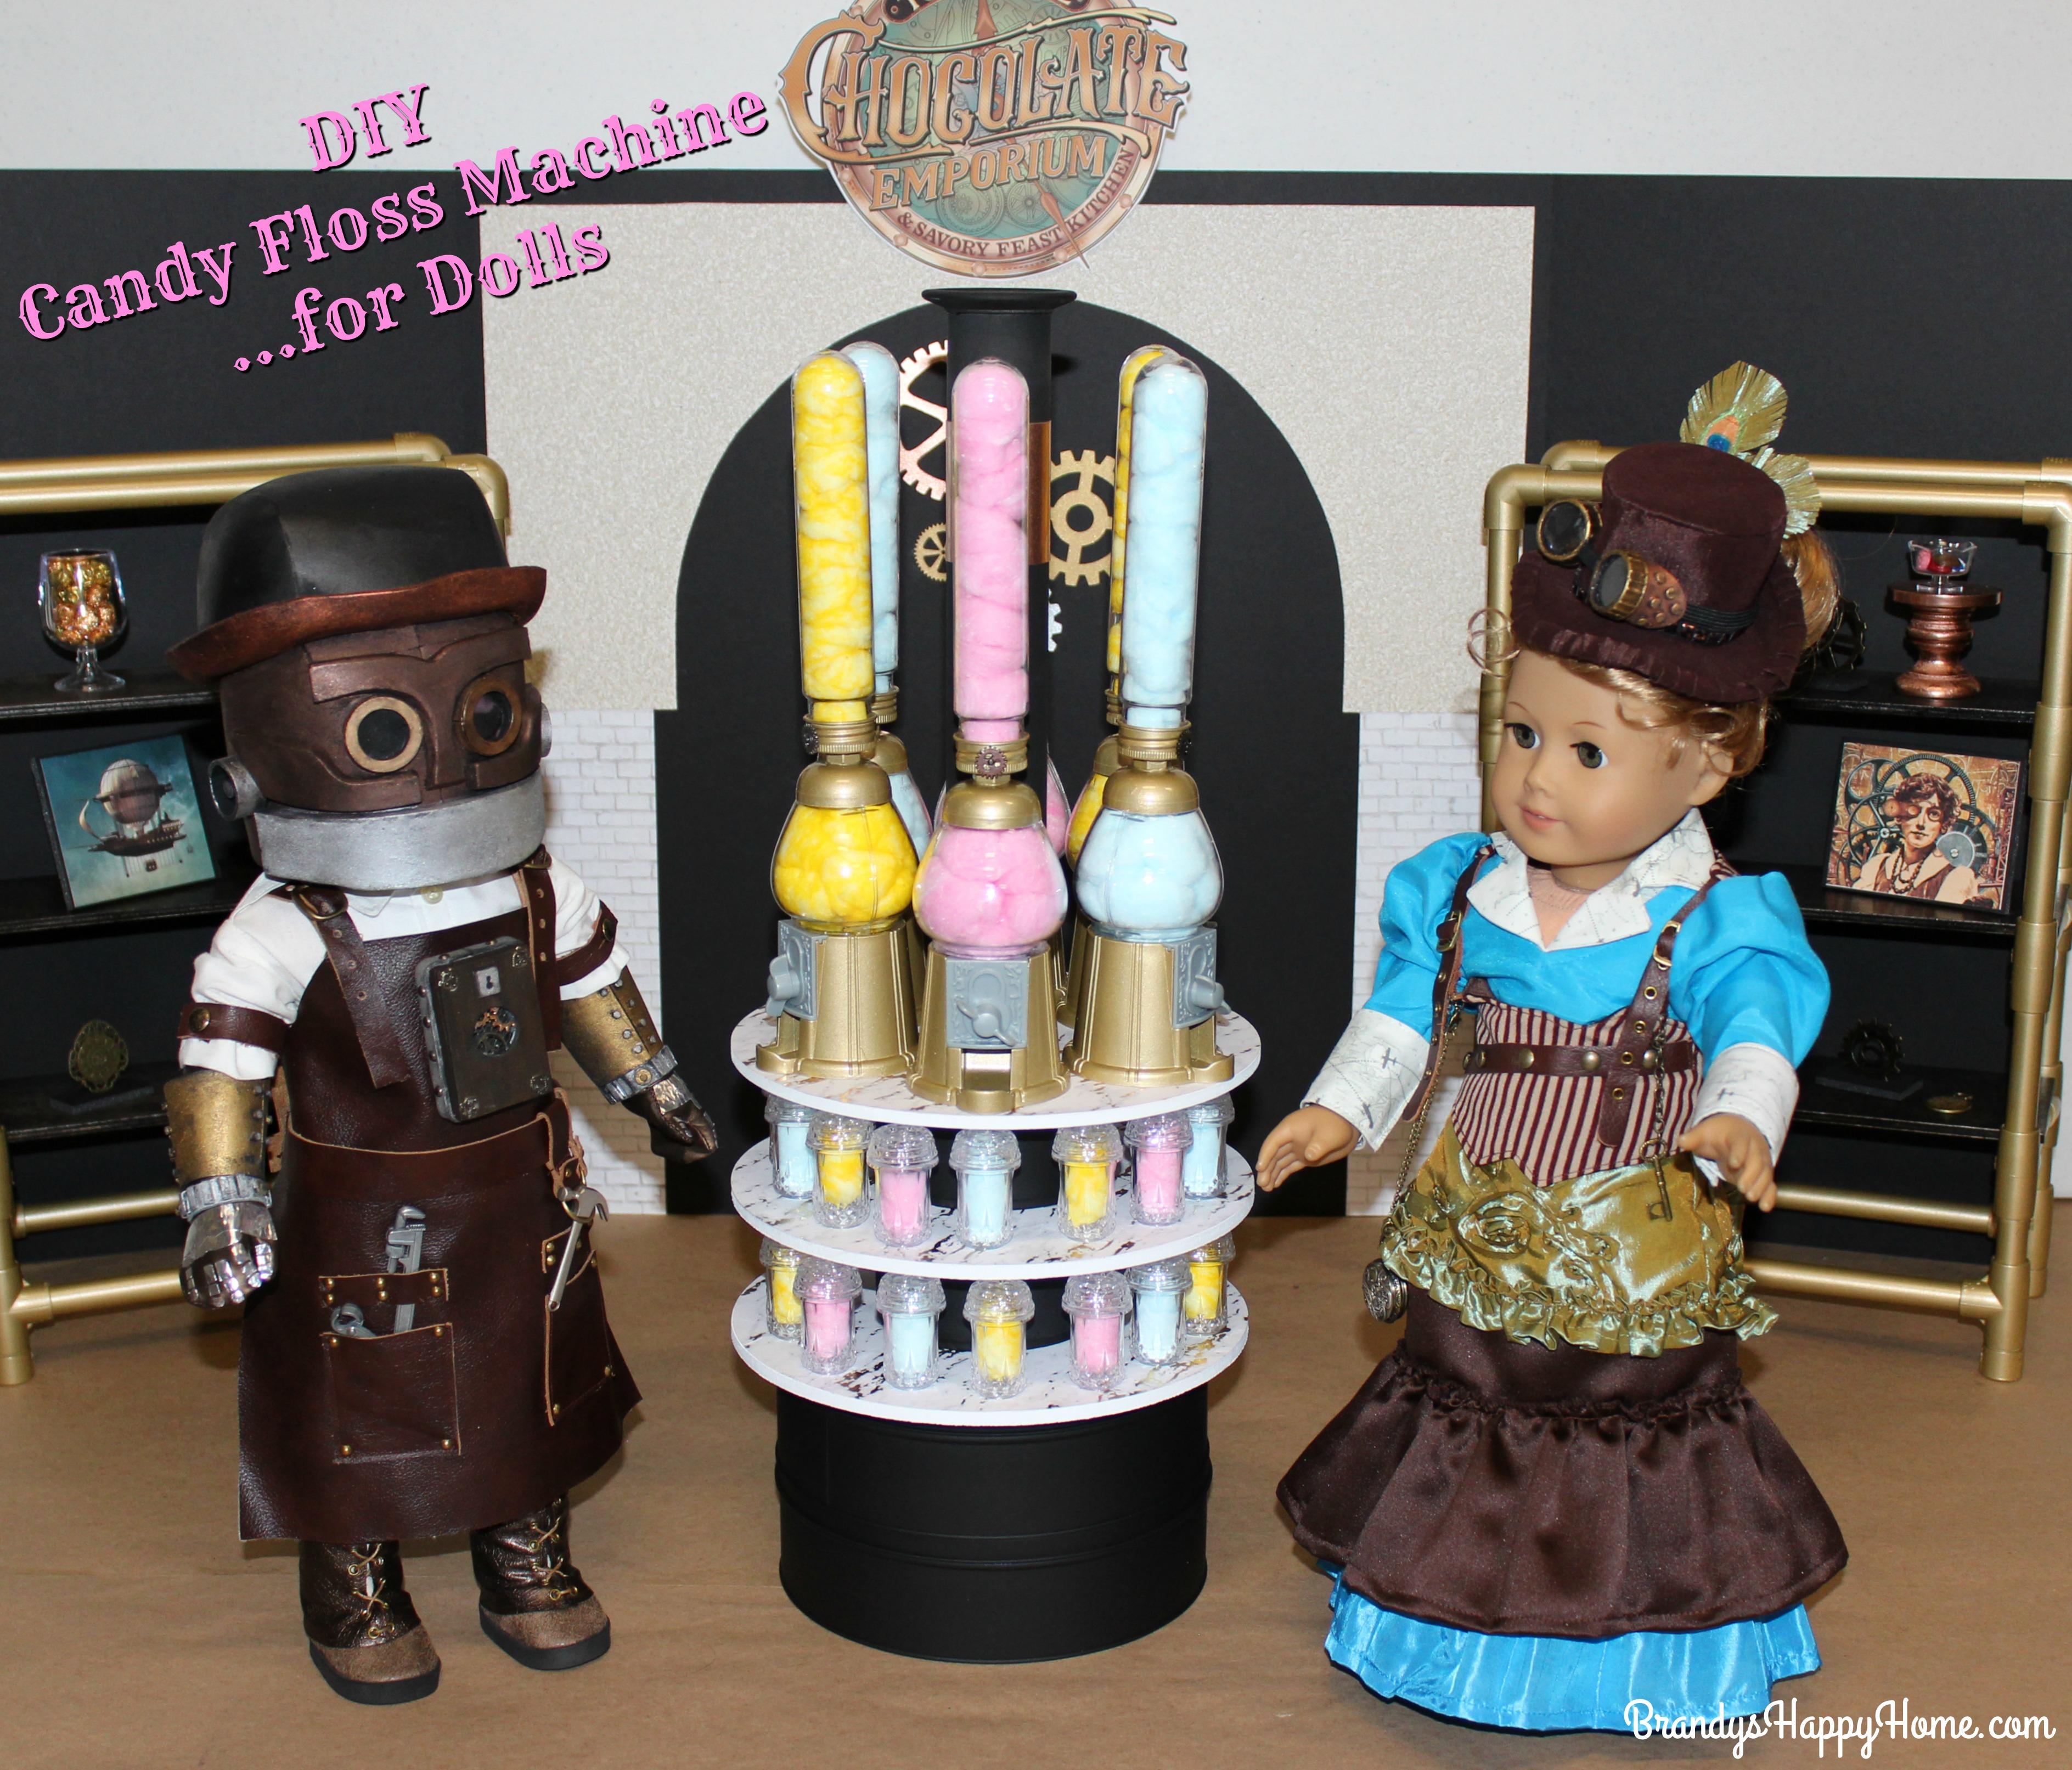 Toothsome Chocolate Emporium For Dolls Diy Candy Floss Machine